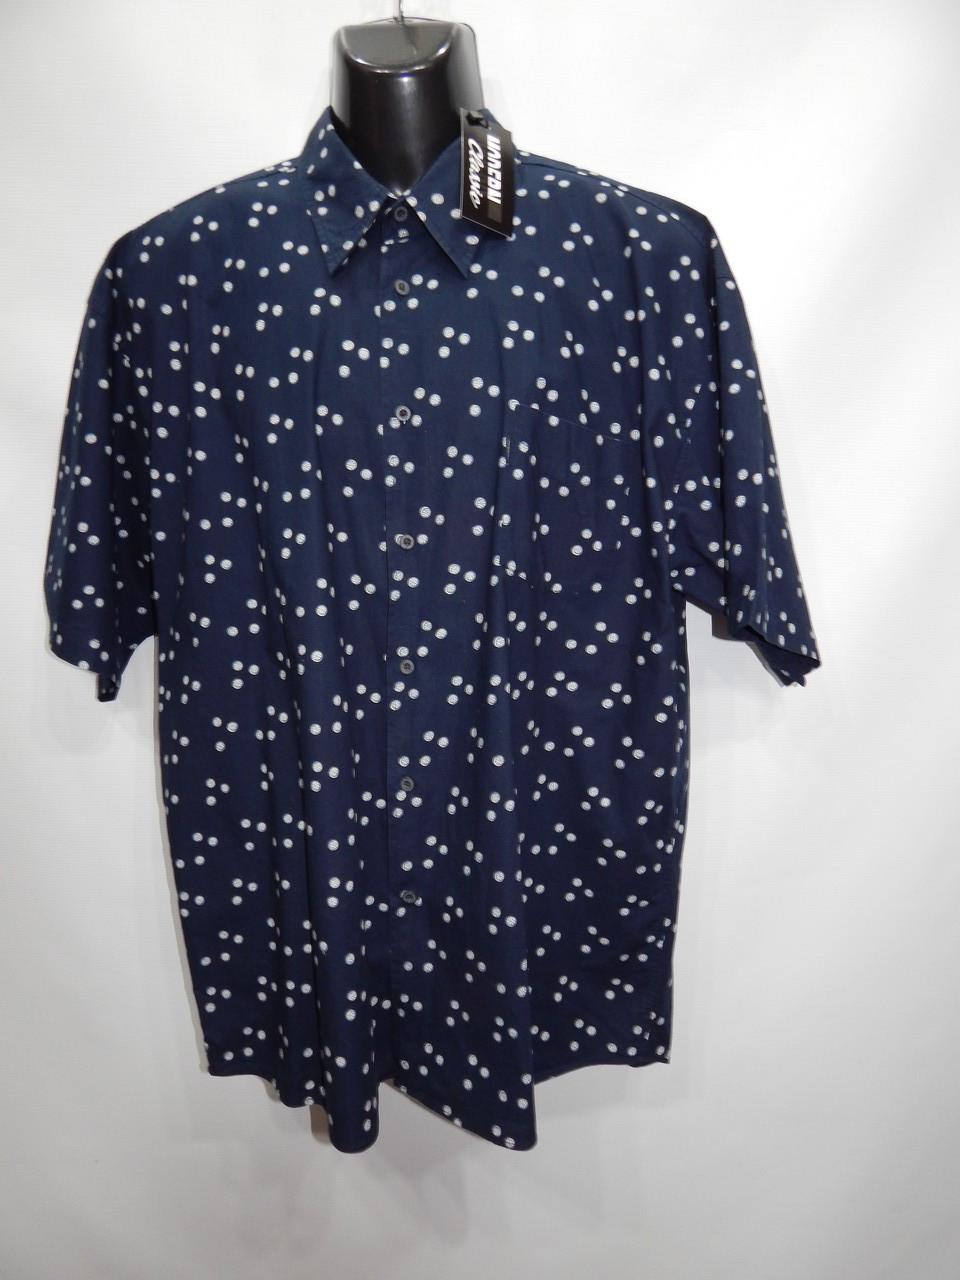 Мужская рубашка с коротким рукавом Lerros оригинал (098КР) р.54 батал